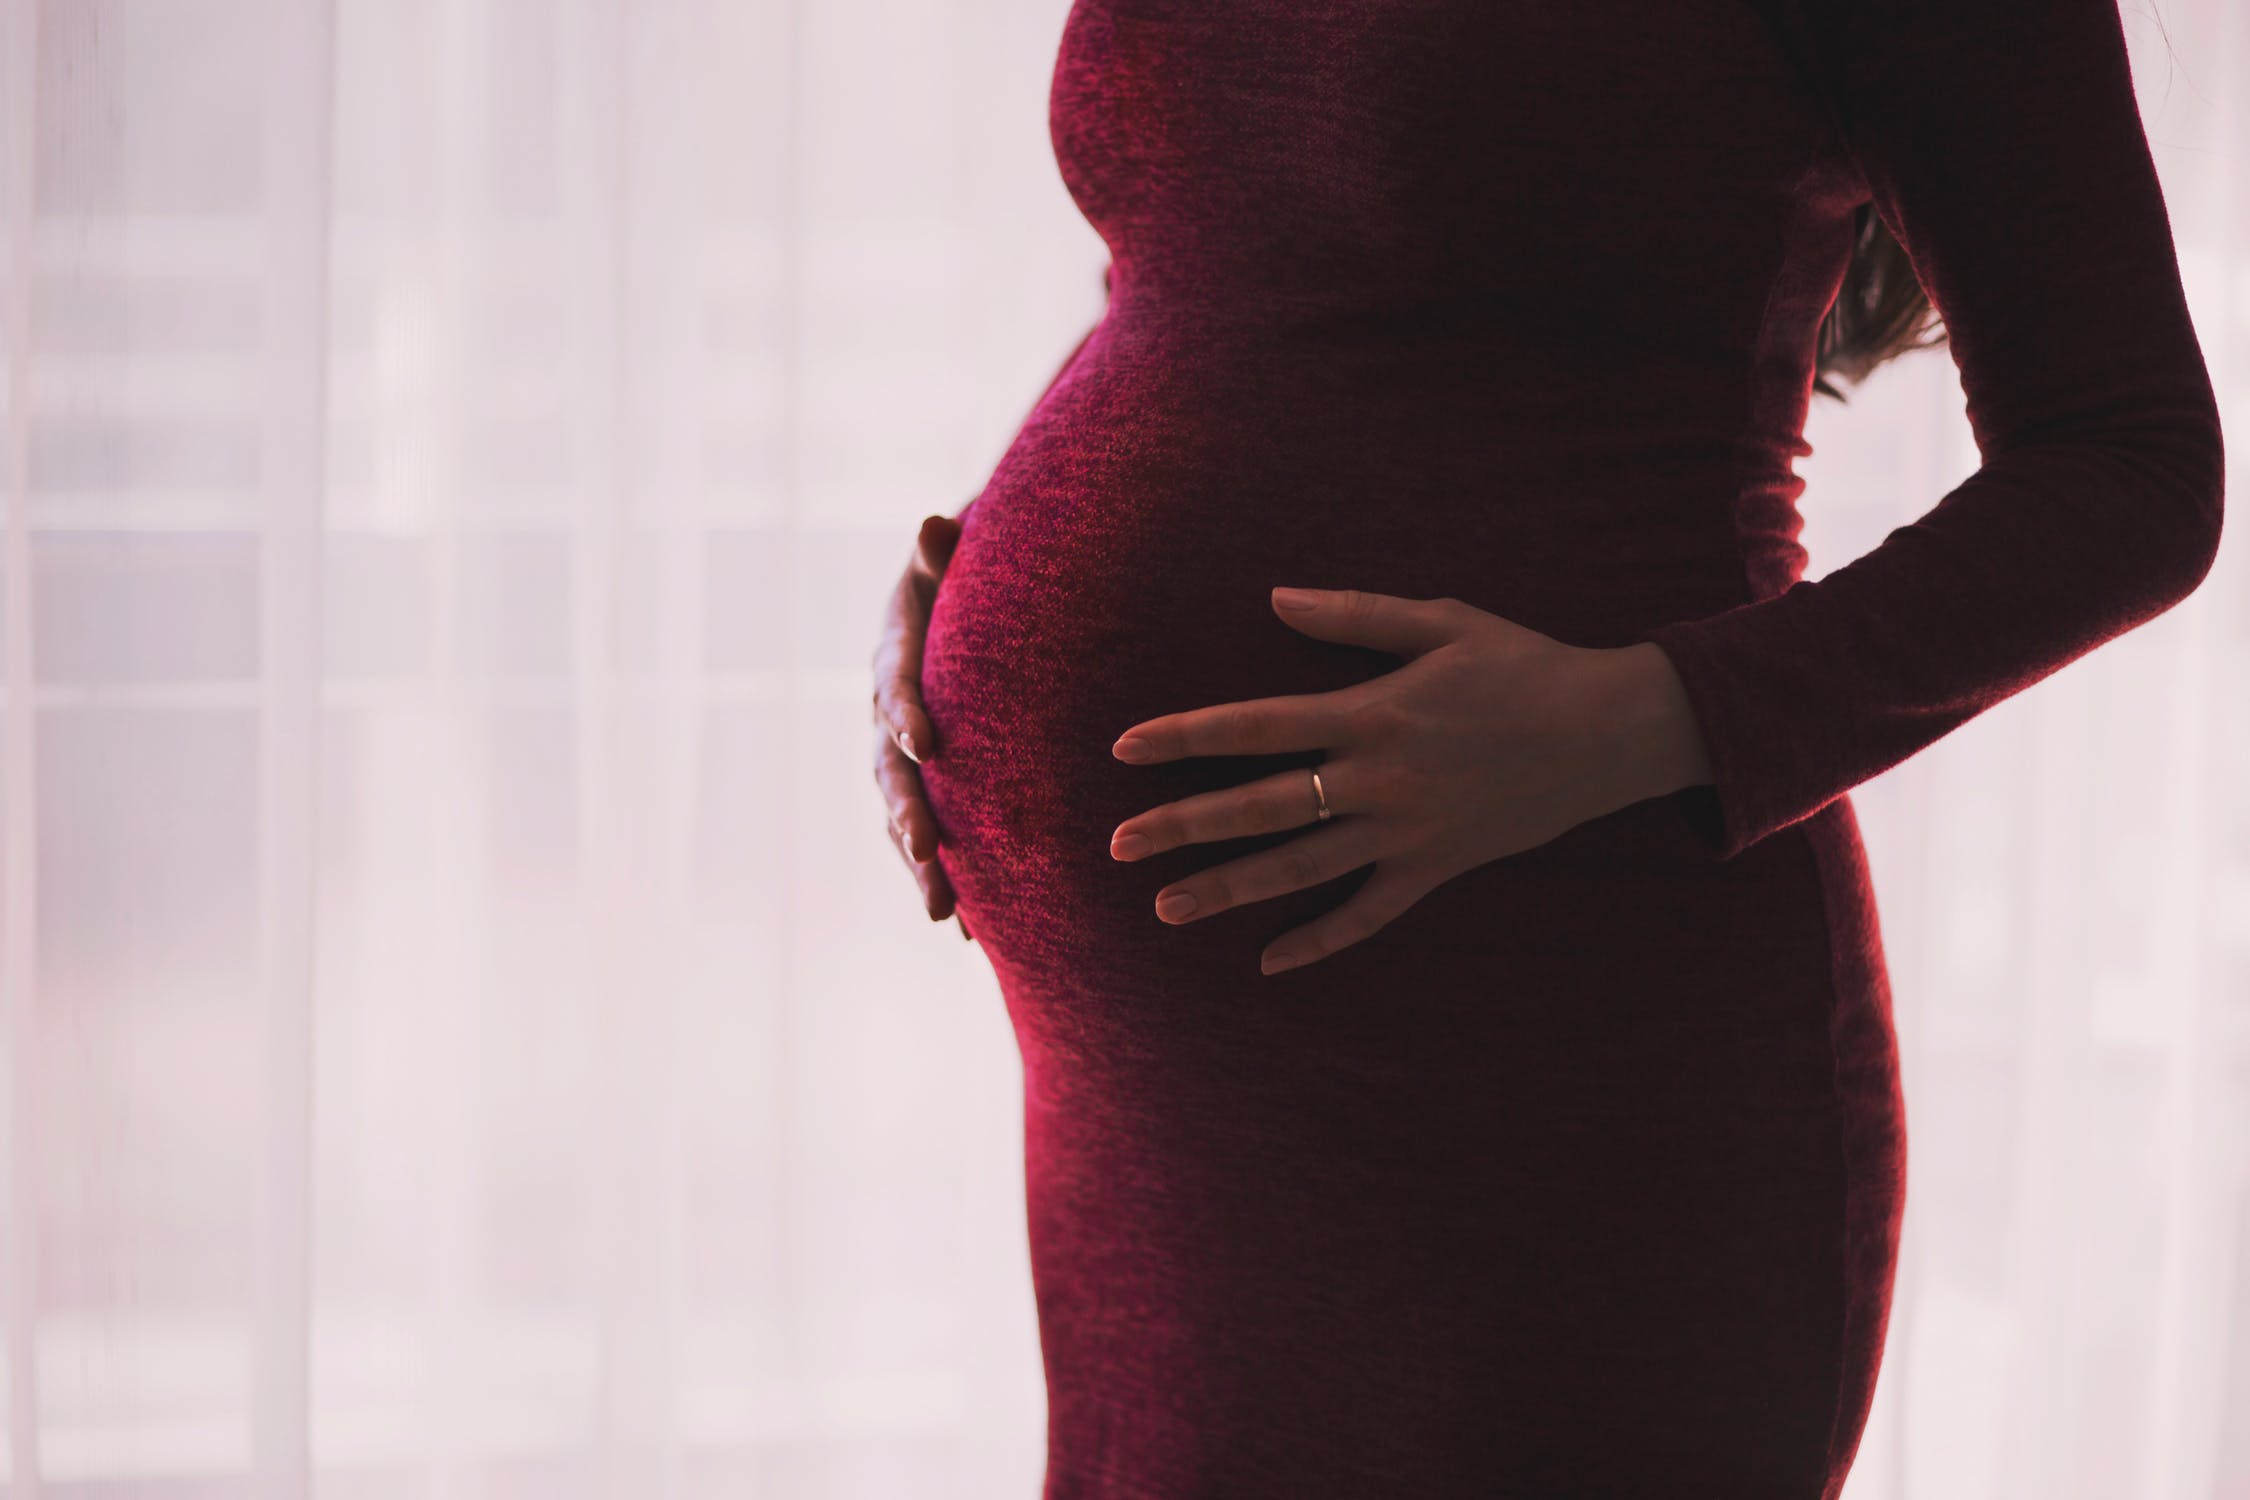 Mitos sobre la barriga de embarazada 🤰🏻